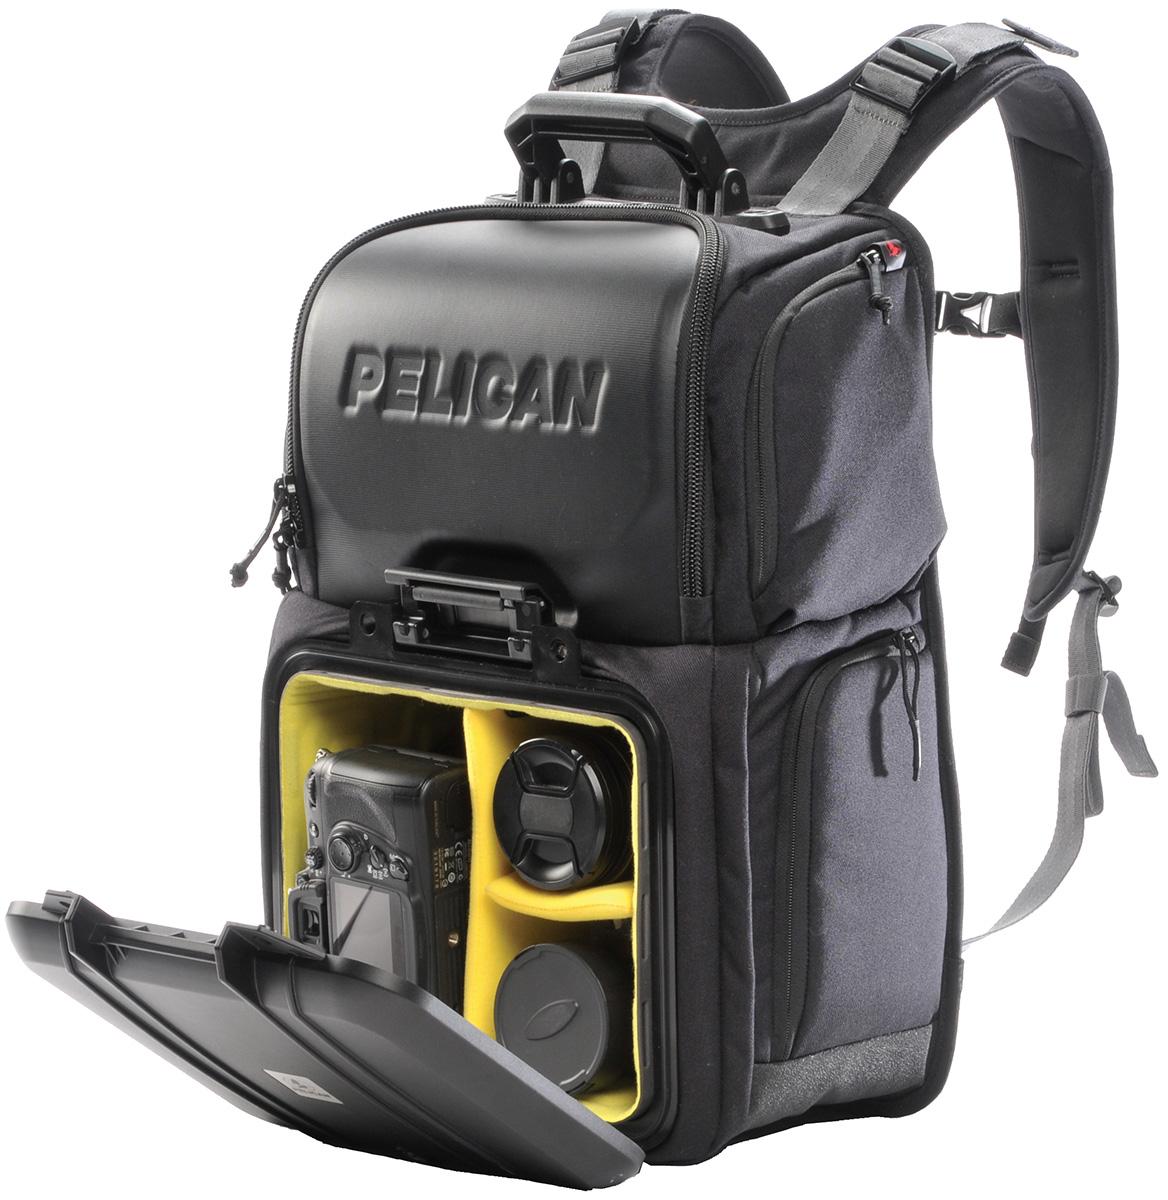 pelican peli products U160 hard photographer camera backpack